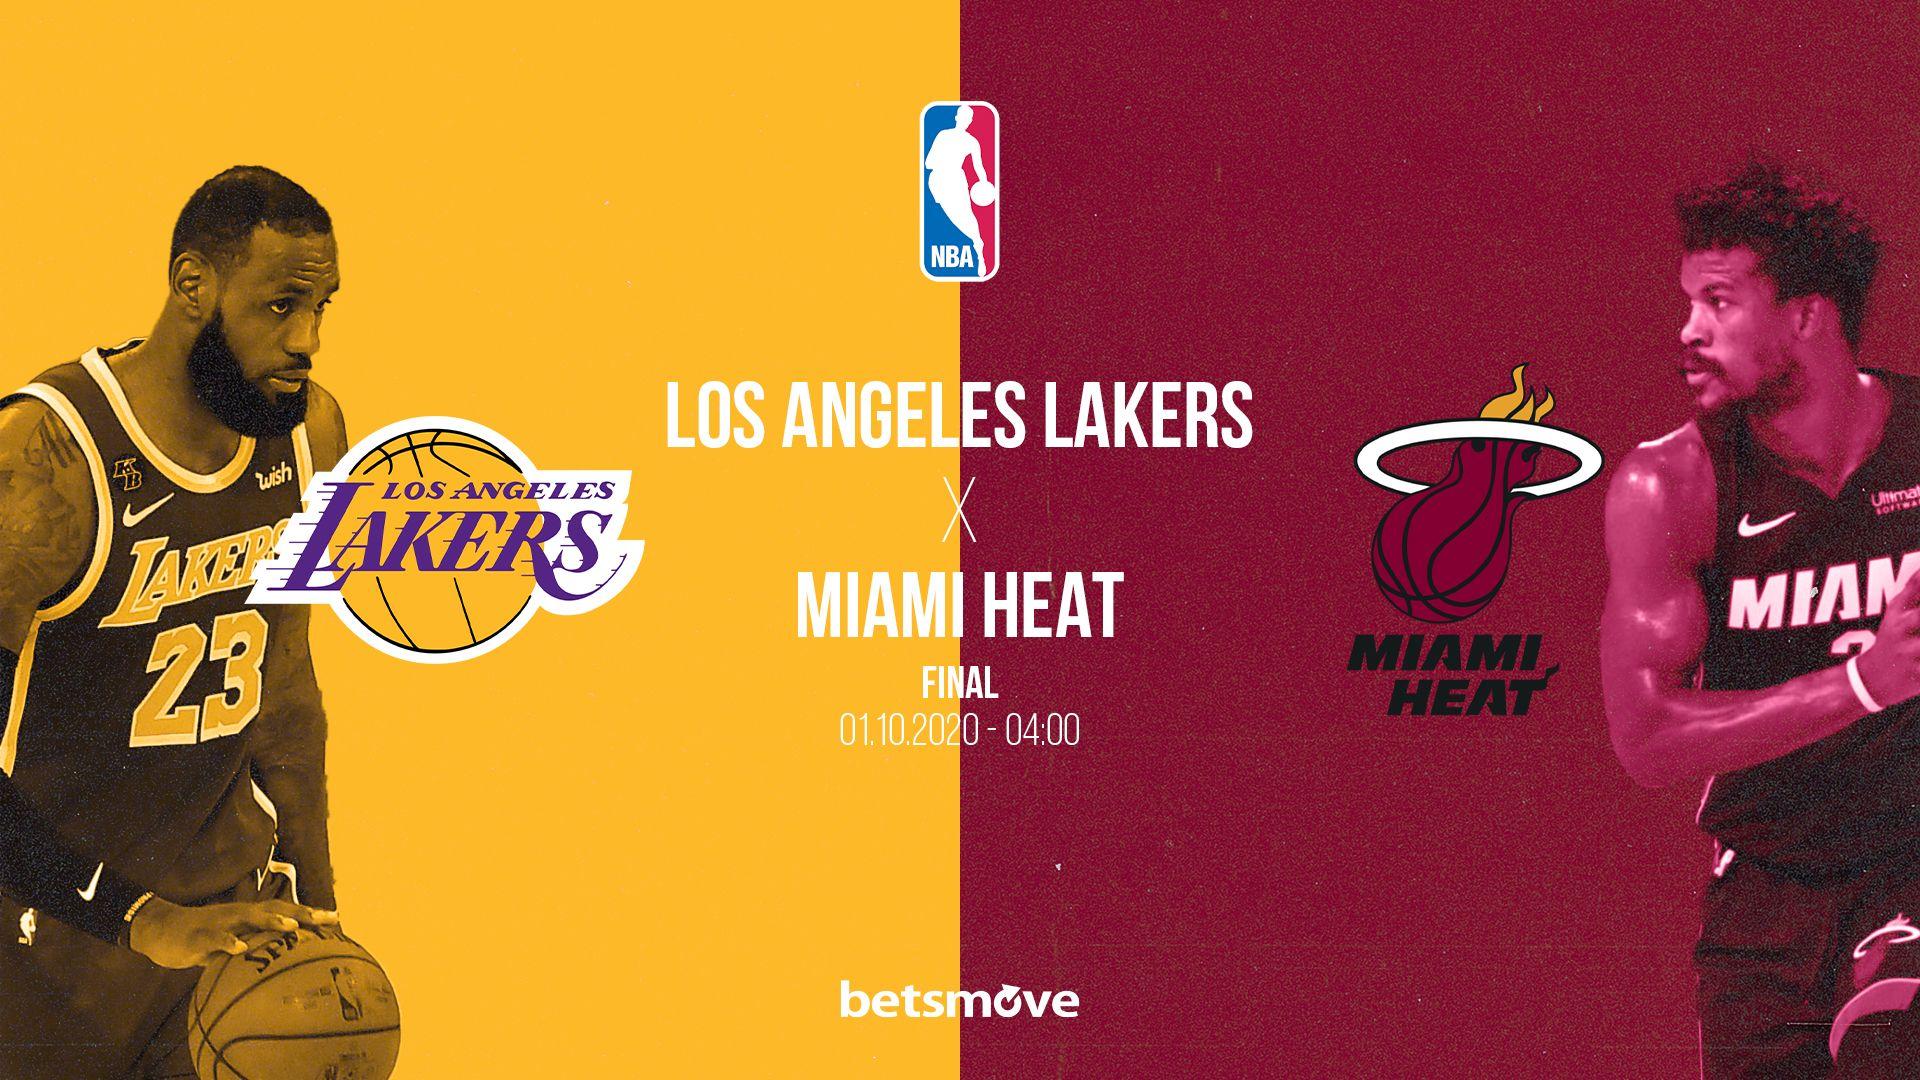 Los Angeles Lakers Miami Heat Canli Izle 2020 Miami Heat Los Angeles Lakers Mac